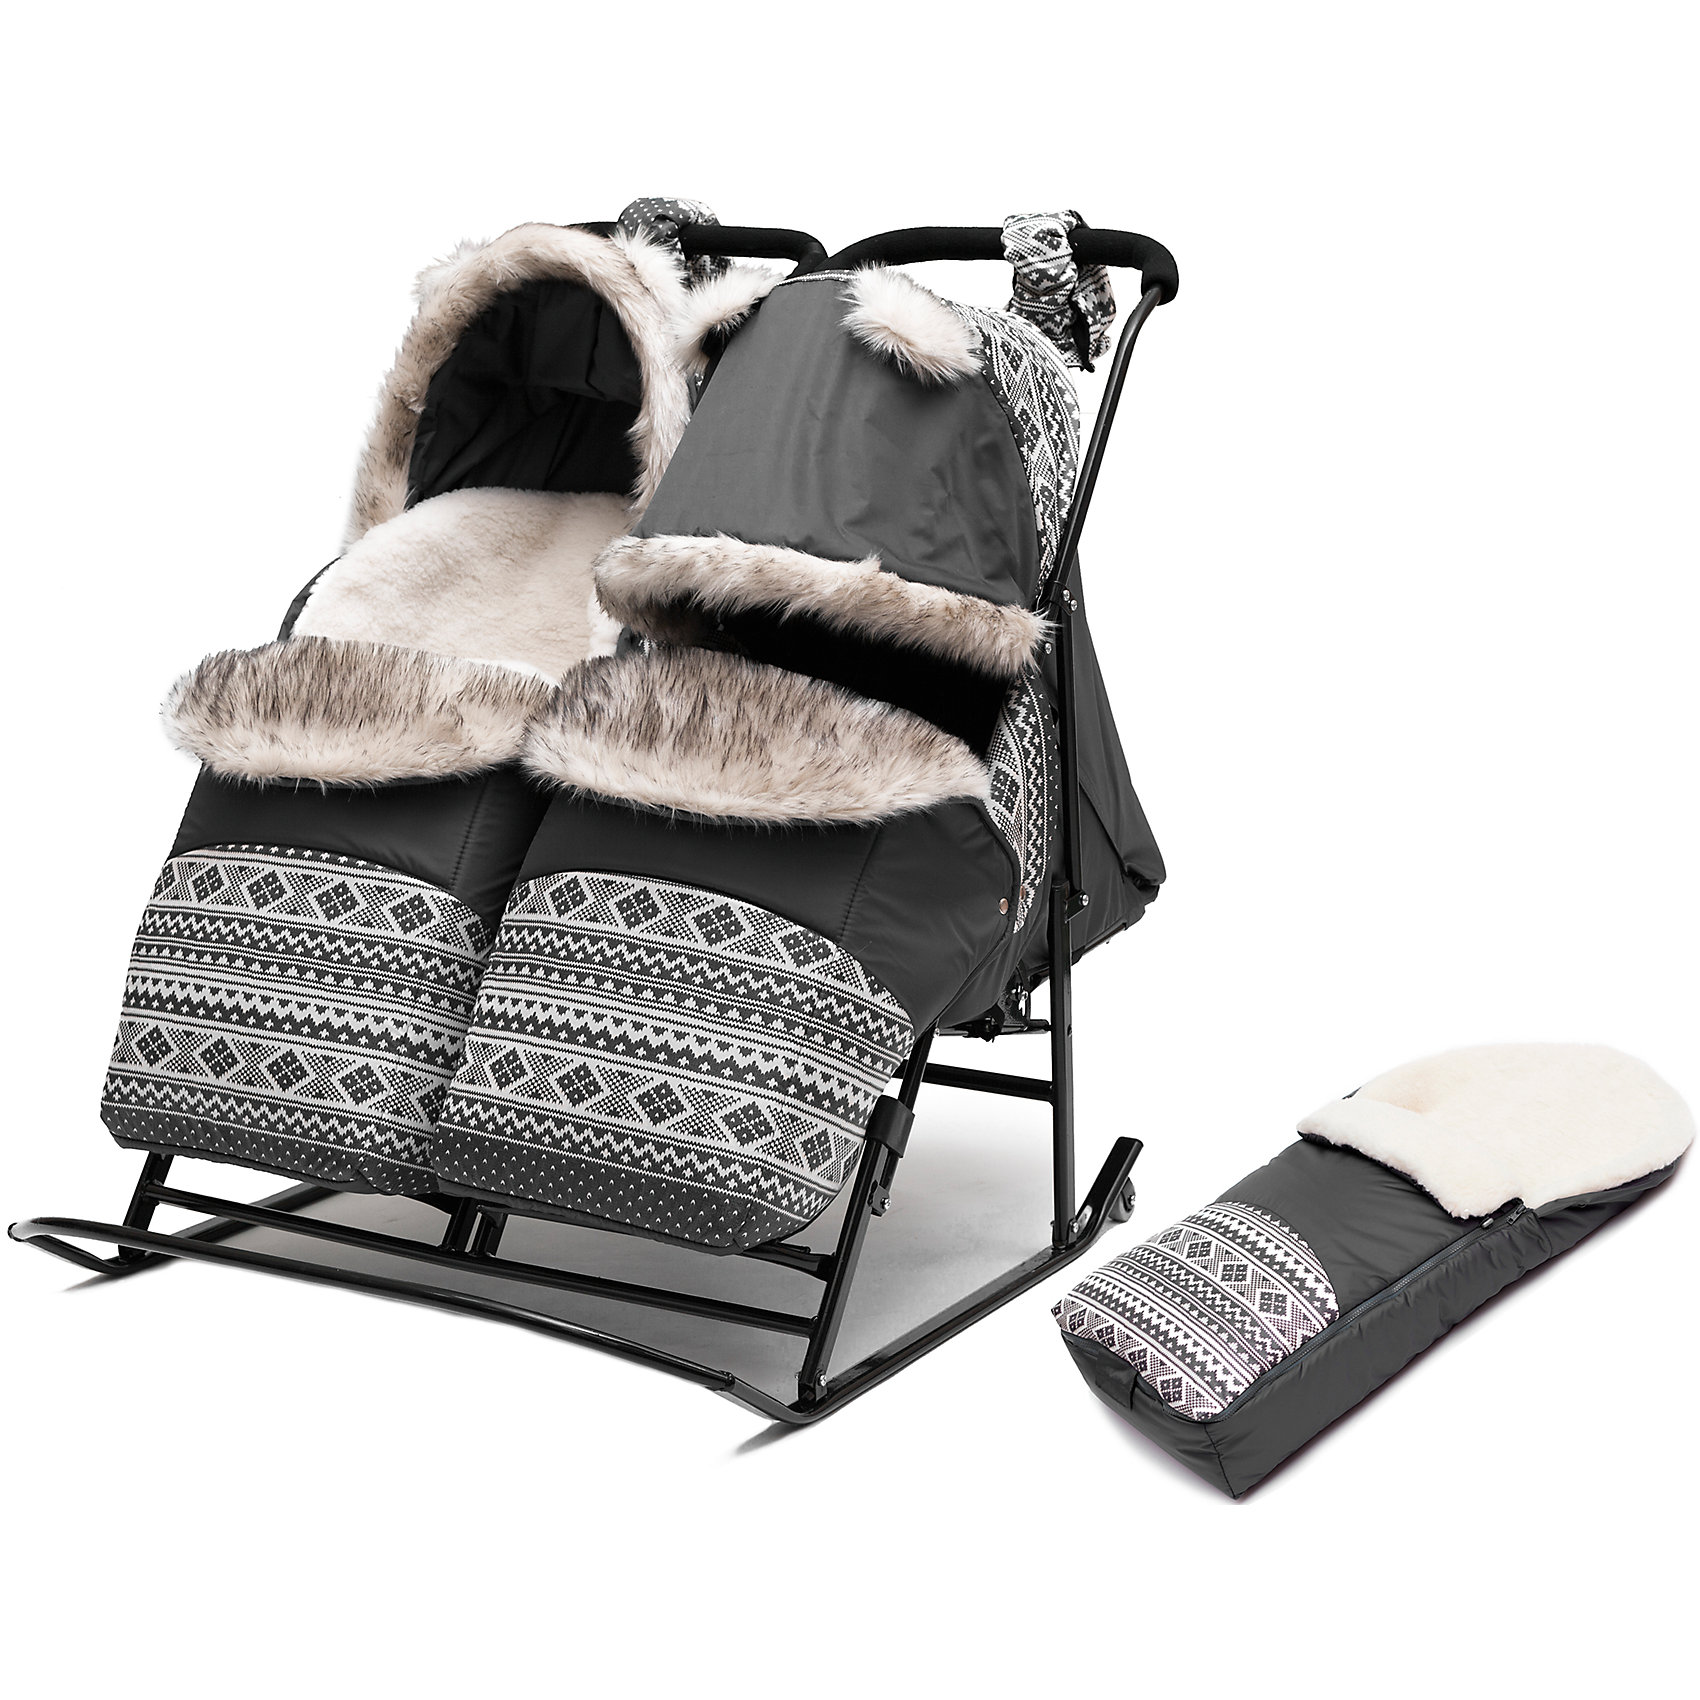 Скандинавия Санки-коляска для двойни Скандинавия 3УВ Экстра Твин, черная рама, ABC Academy, серый цена